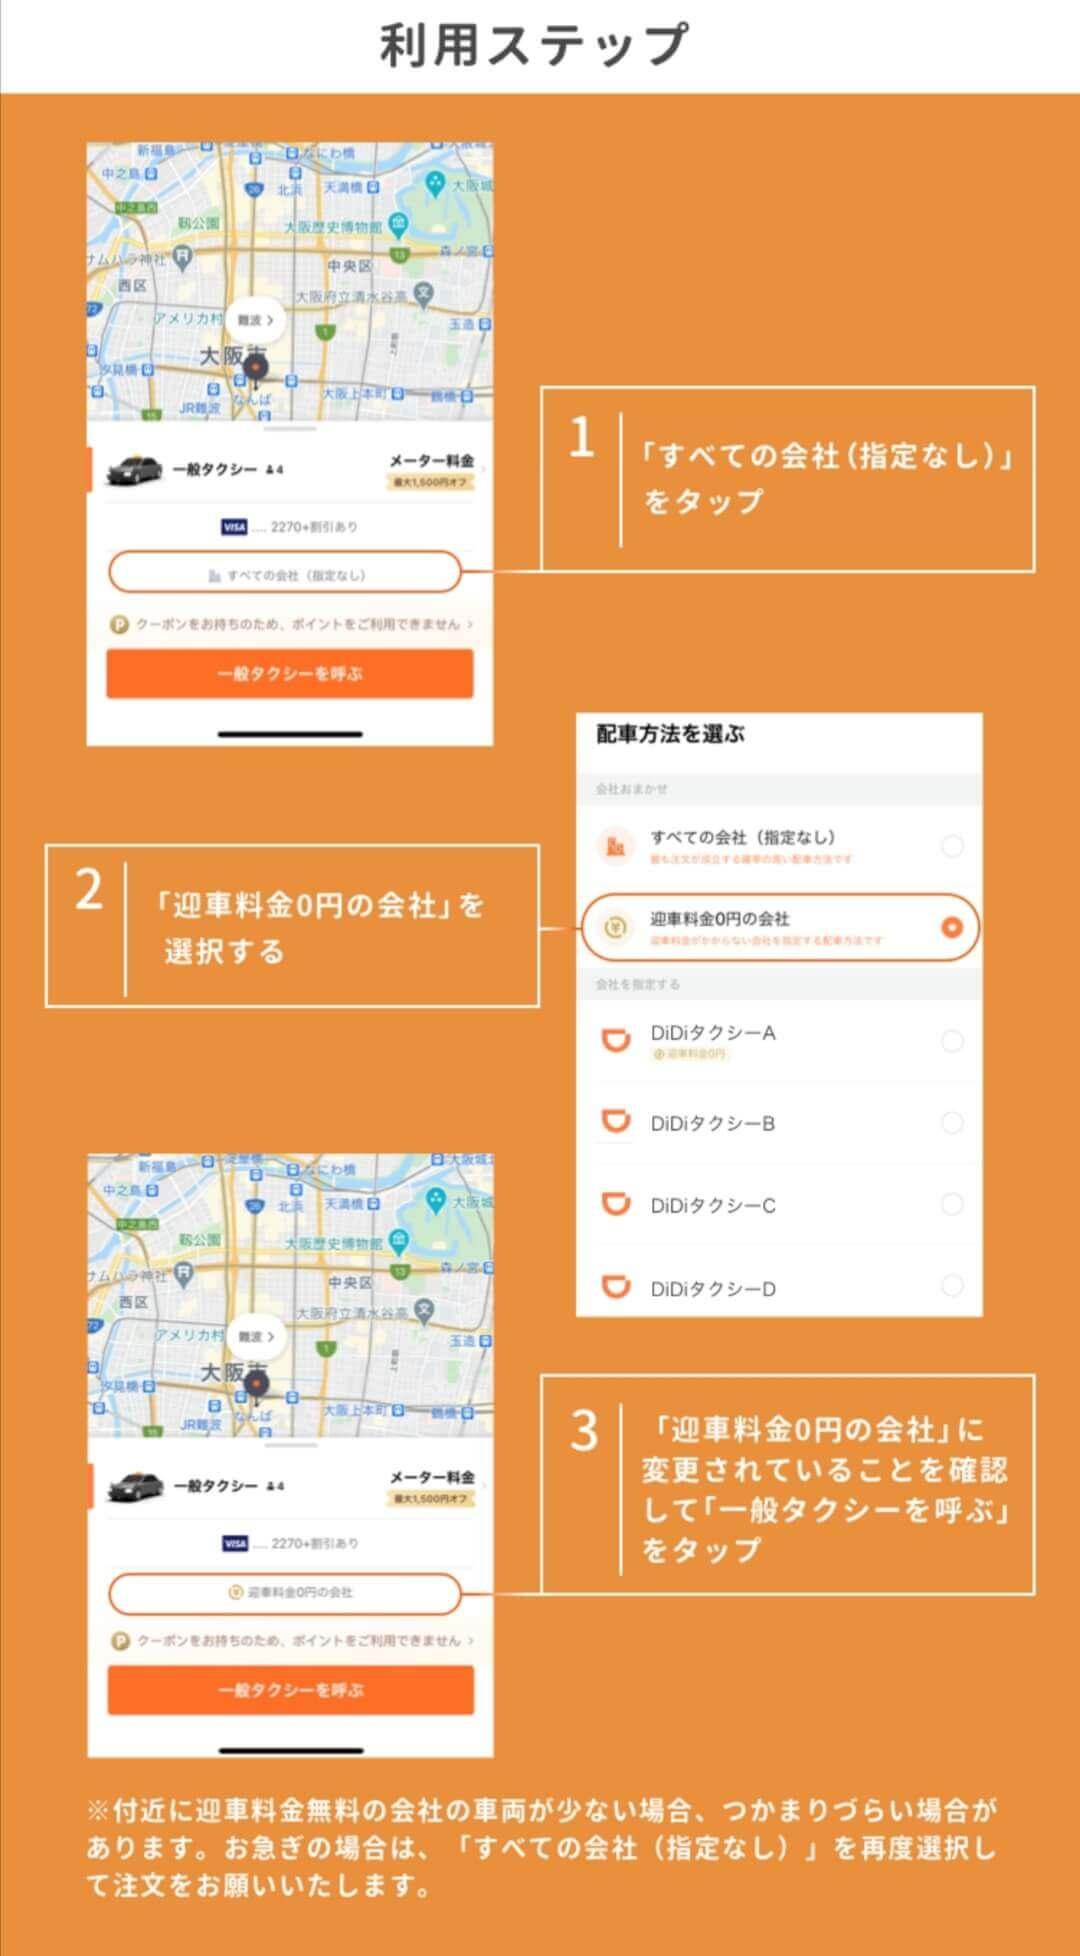 DiDi(ディディ)タクシー迎車料金無料のタクシーが呼べる【愛知・京都・大阪・兵庫限定】